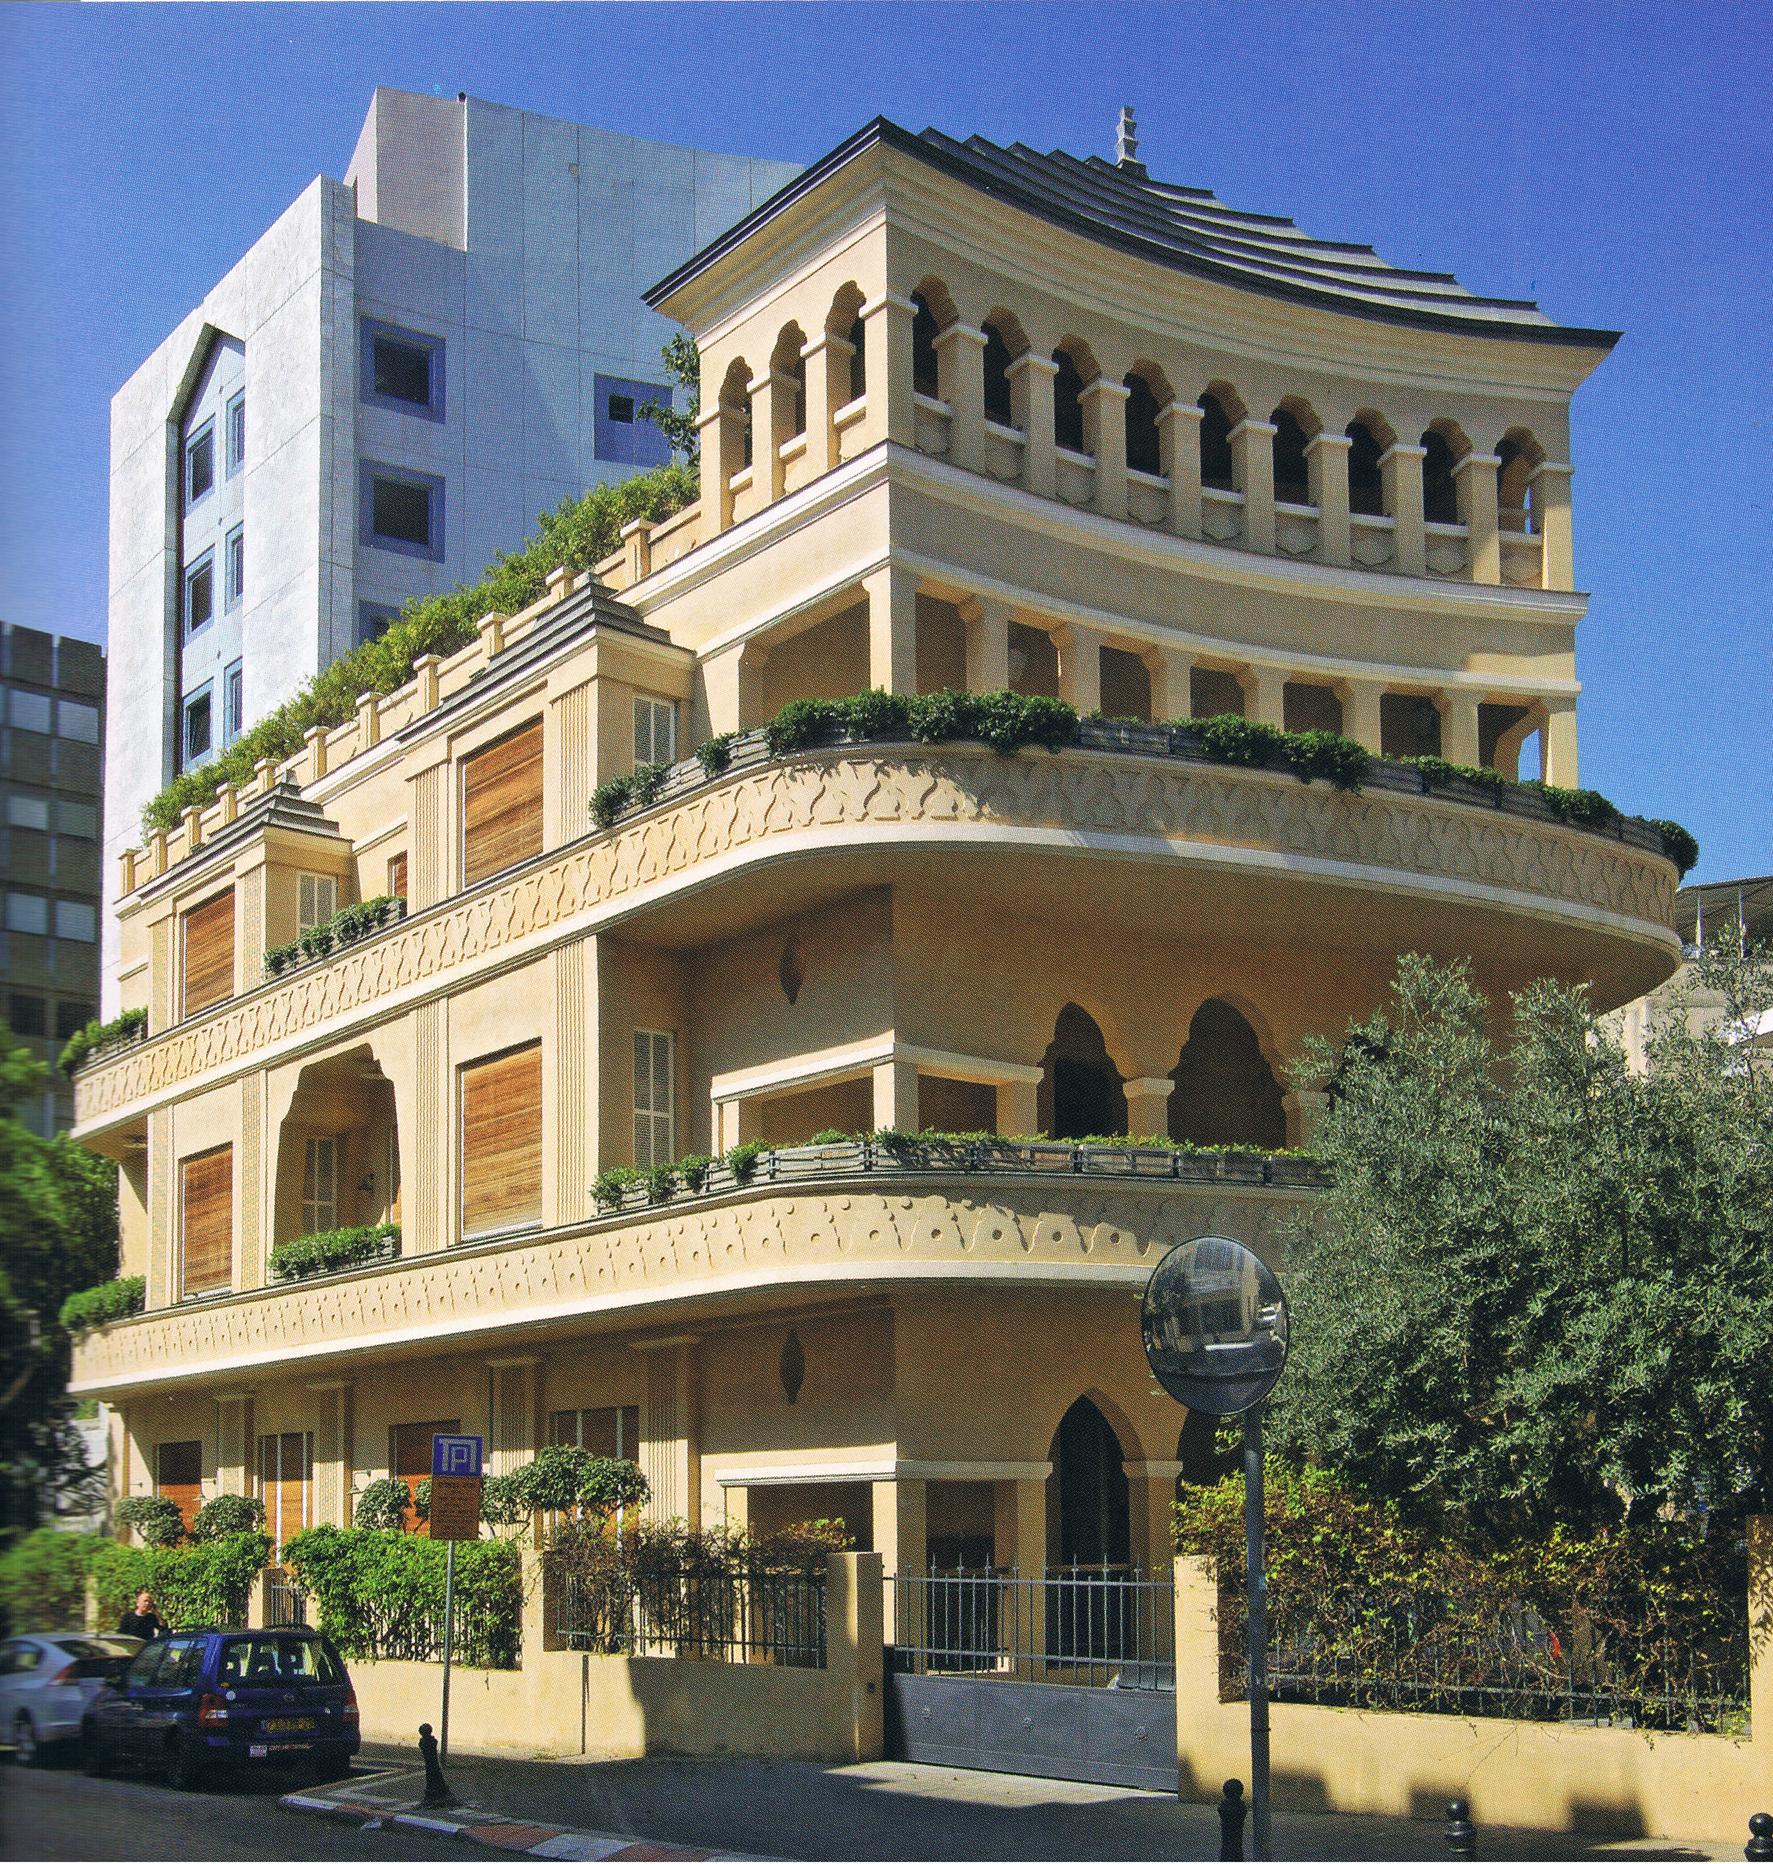 Tel Aviv - Jaffa Tours